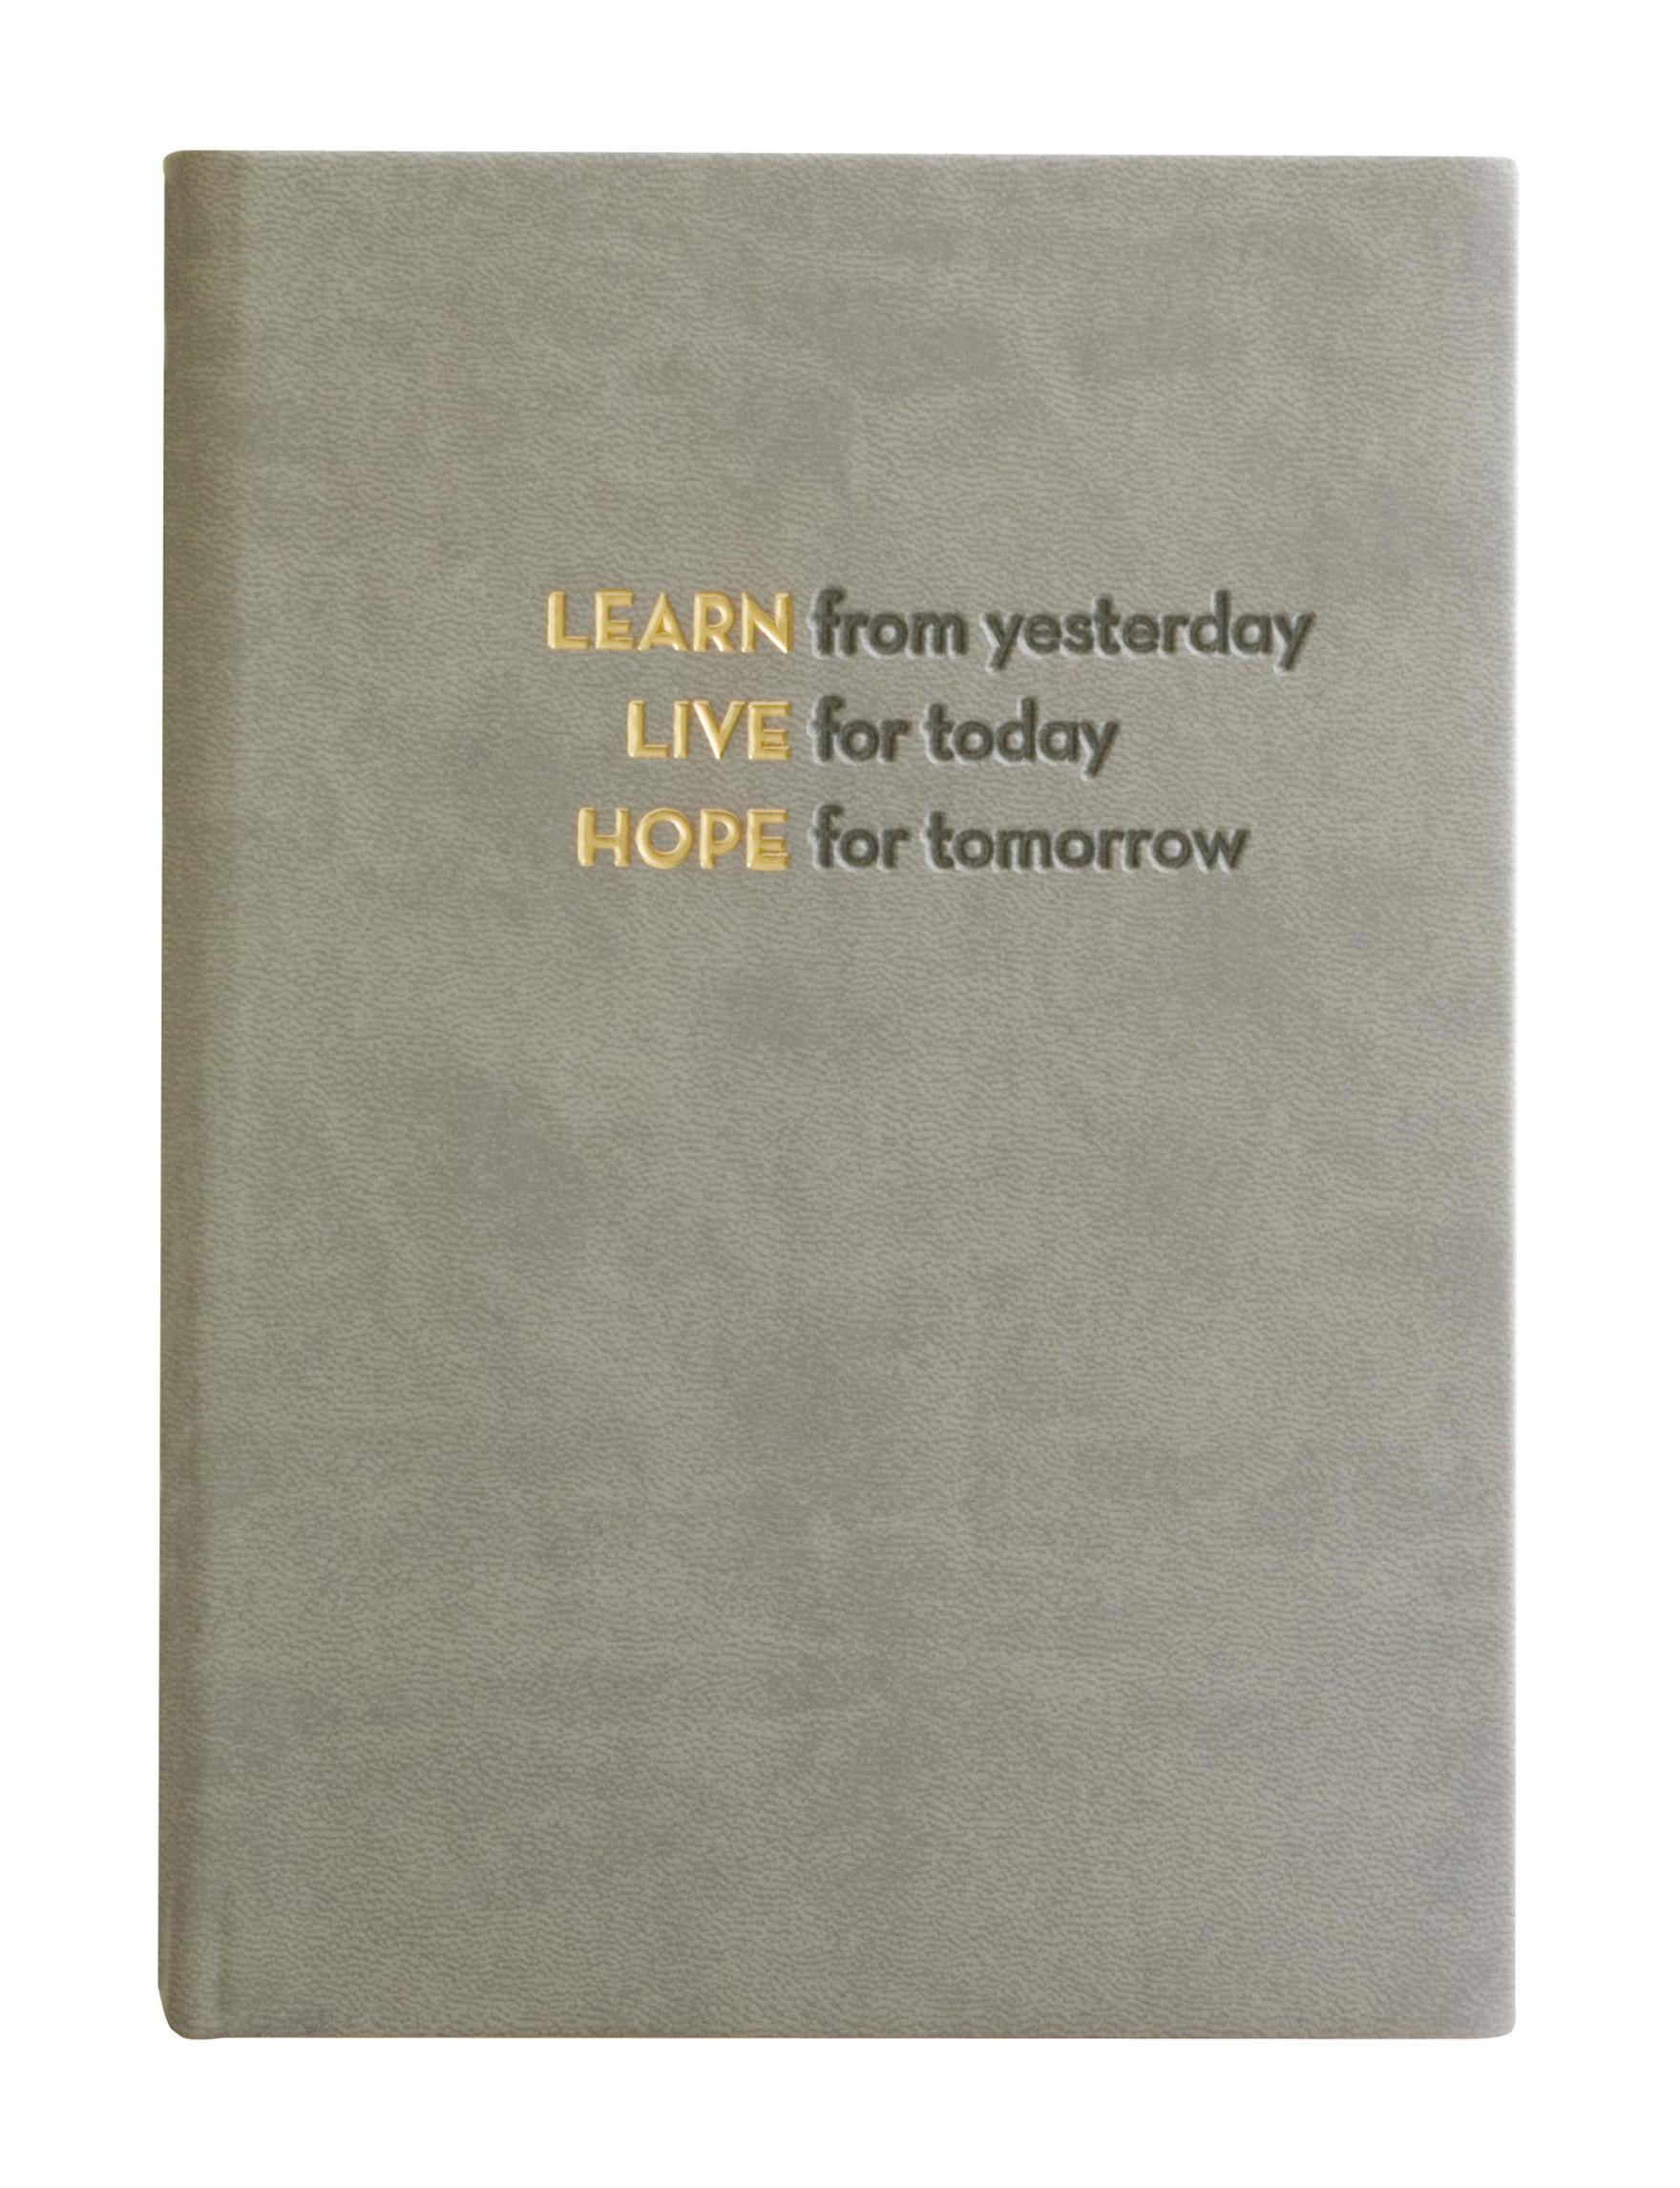 Eccolo Grey Journals & Notepads School & Office Supplies